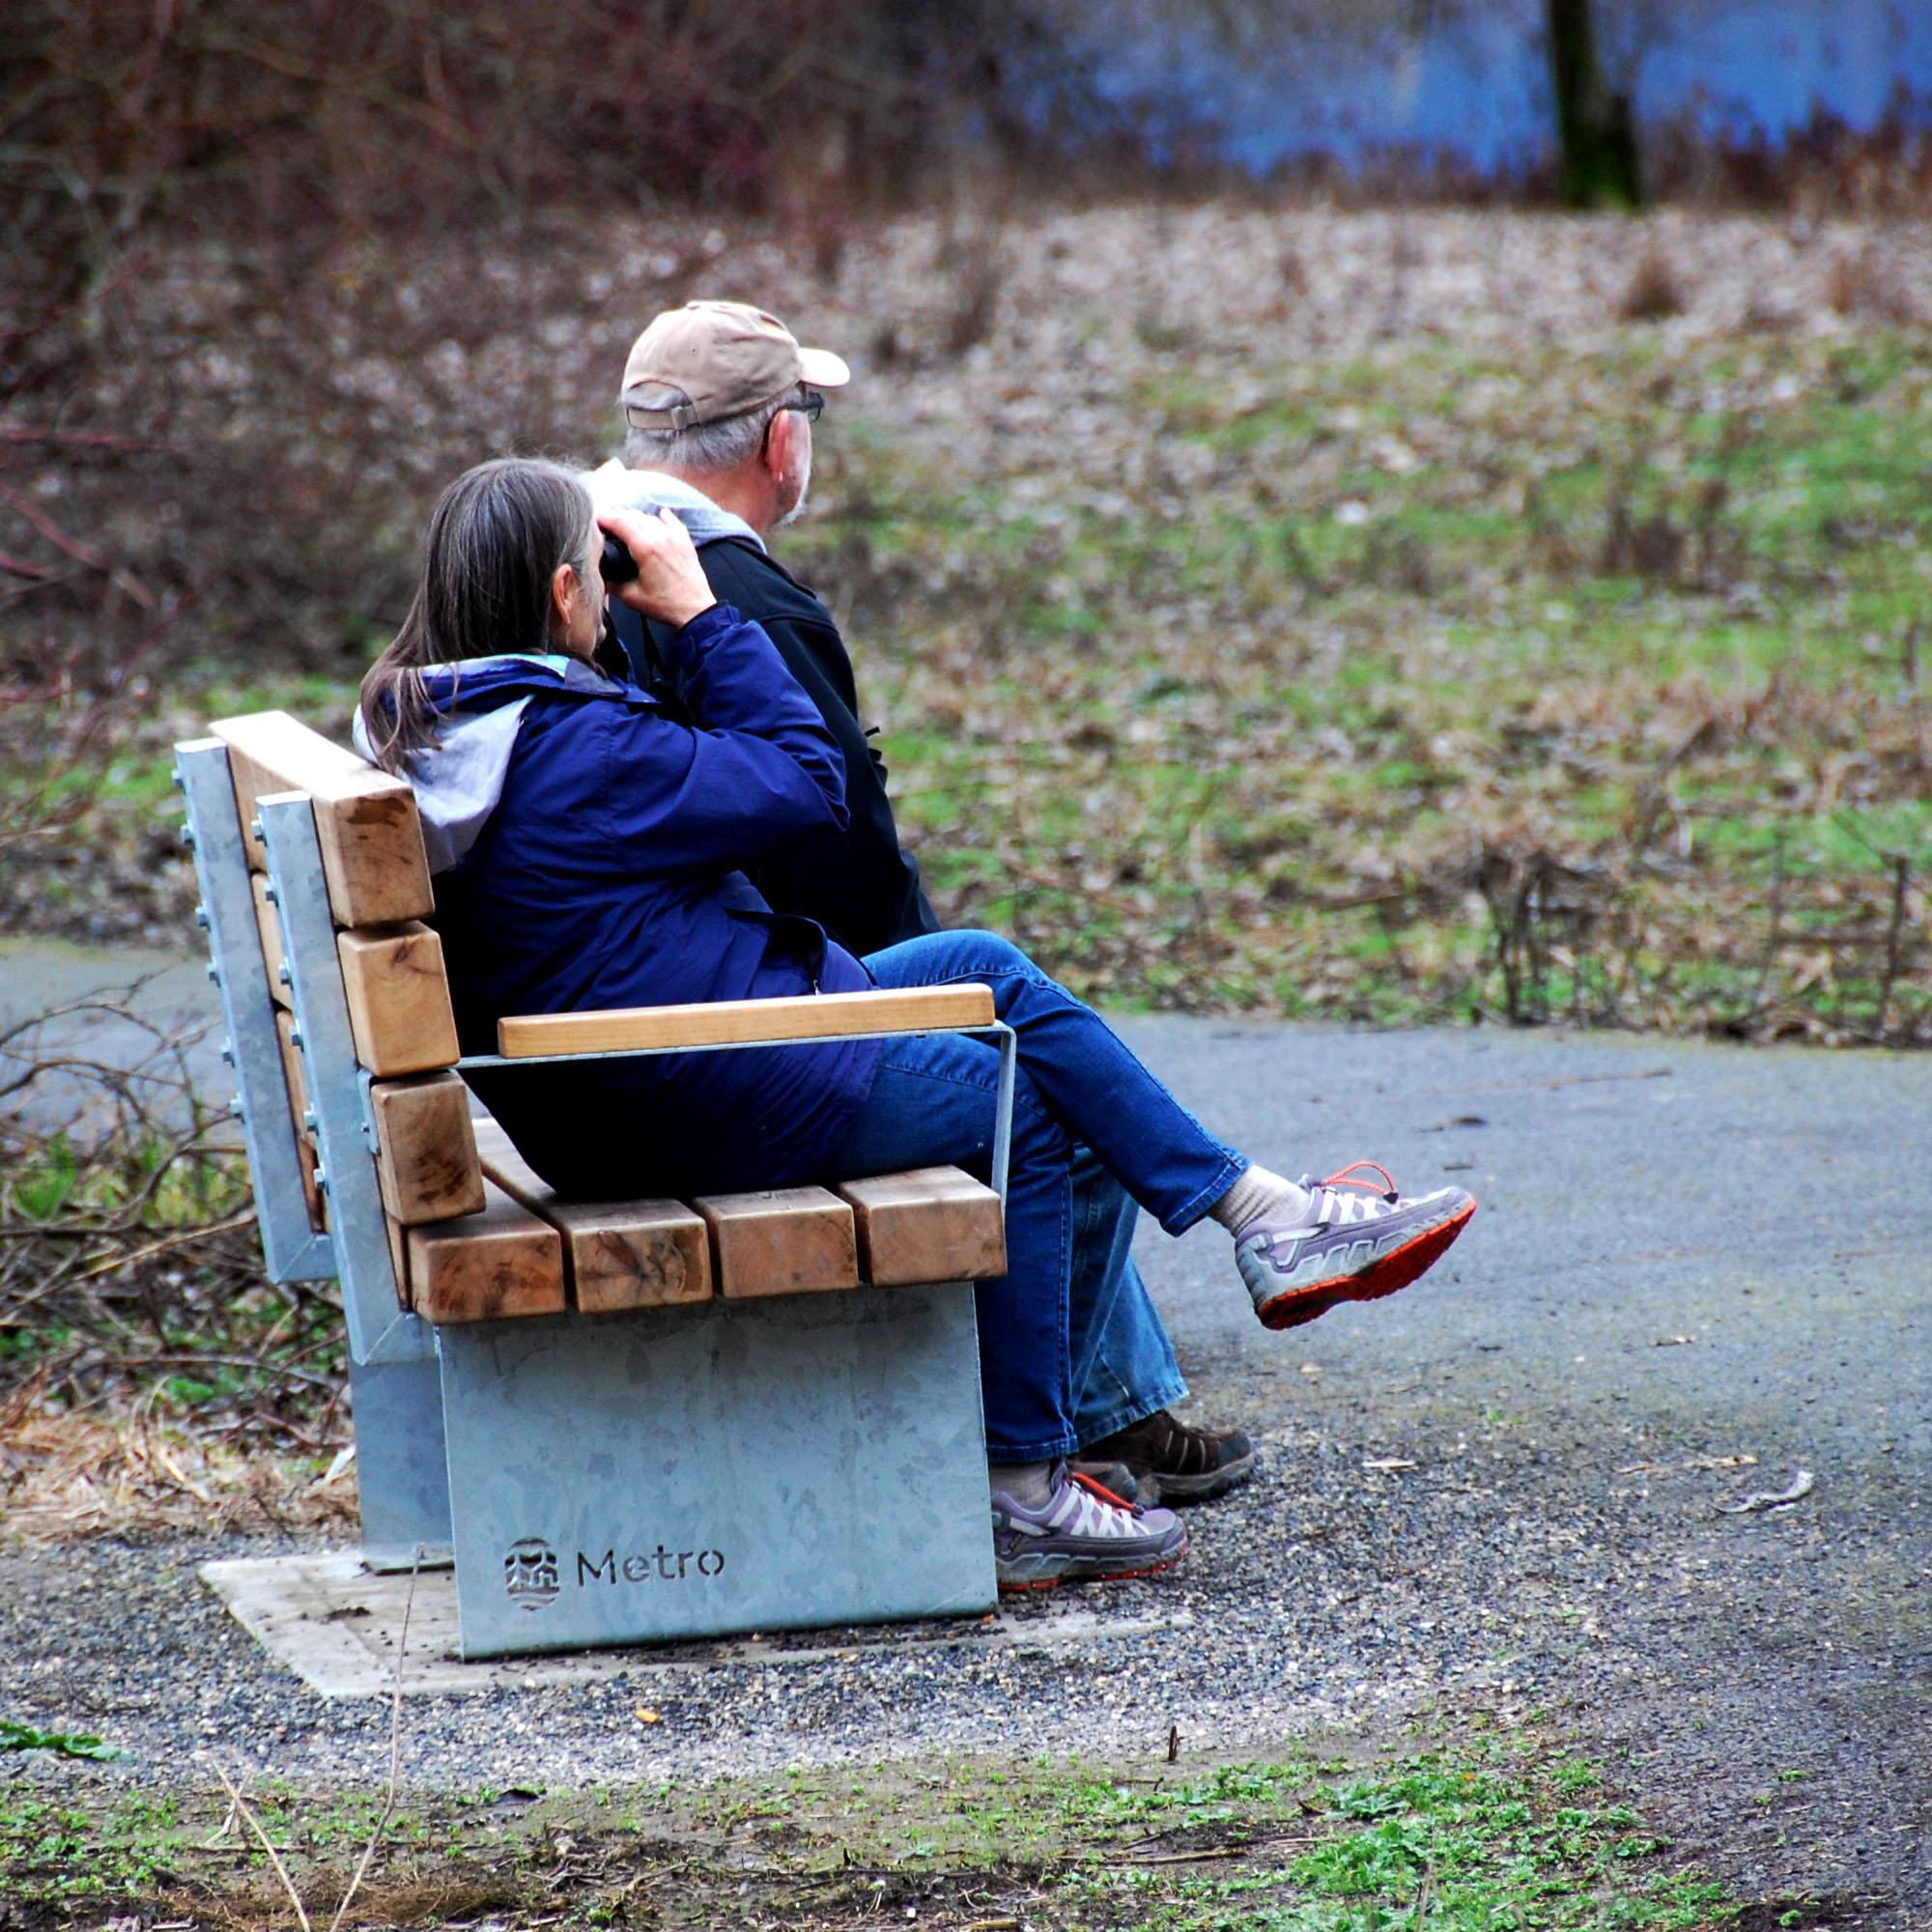 Metro Bench - Birdwatching Couple.jpg